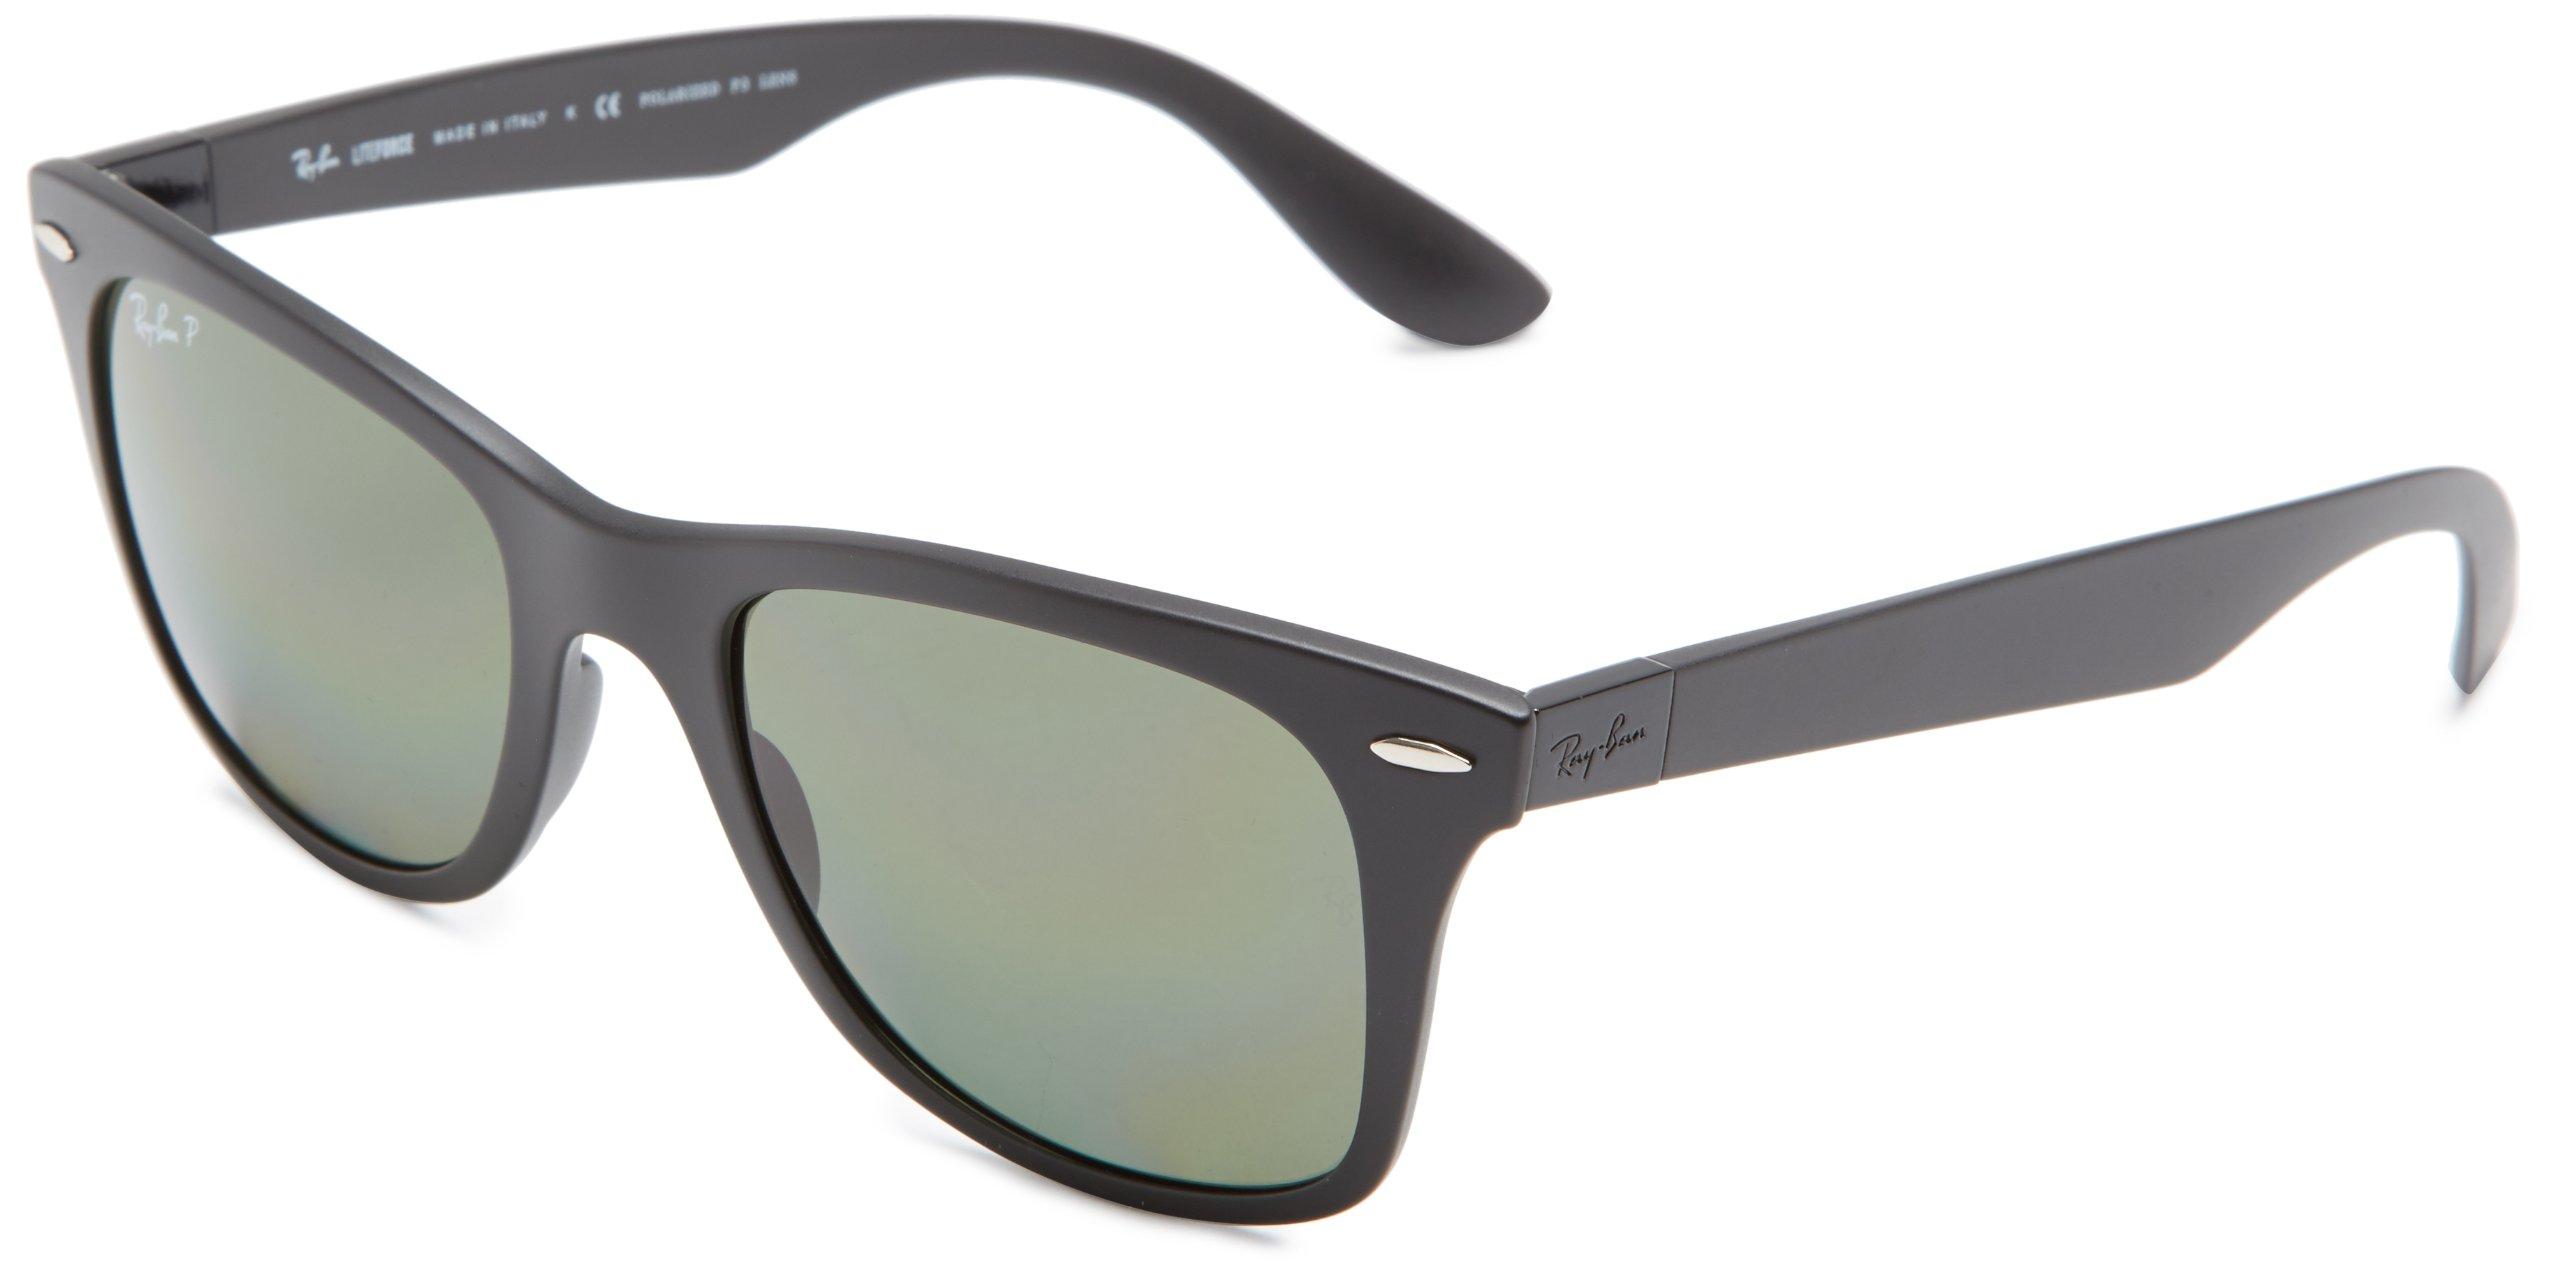 RAY-BAN RB4195 Wayfarer Liteforce Sunglasses, Matte Black/Polarized Green, 52 mm by RAY-BAN